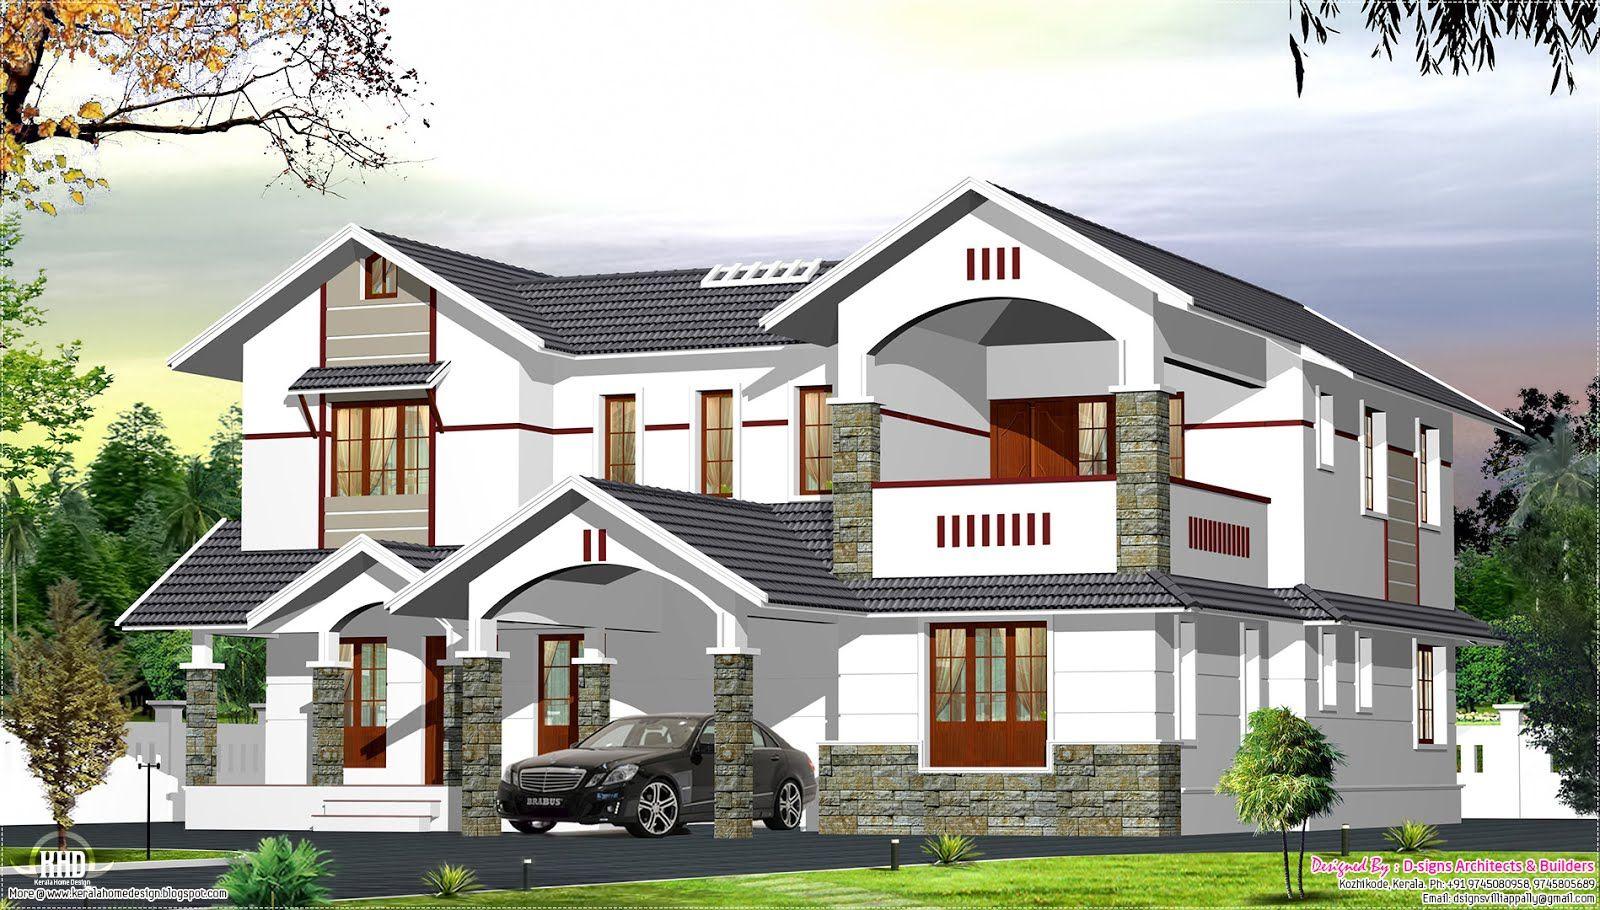 Image Result For Parking Roof Design In Single Floor Kerala House